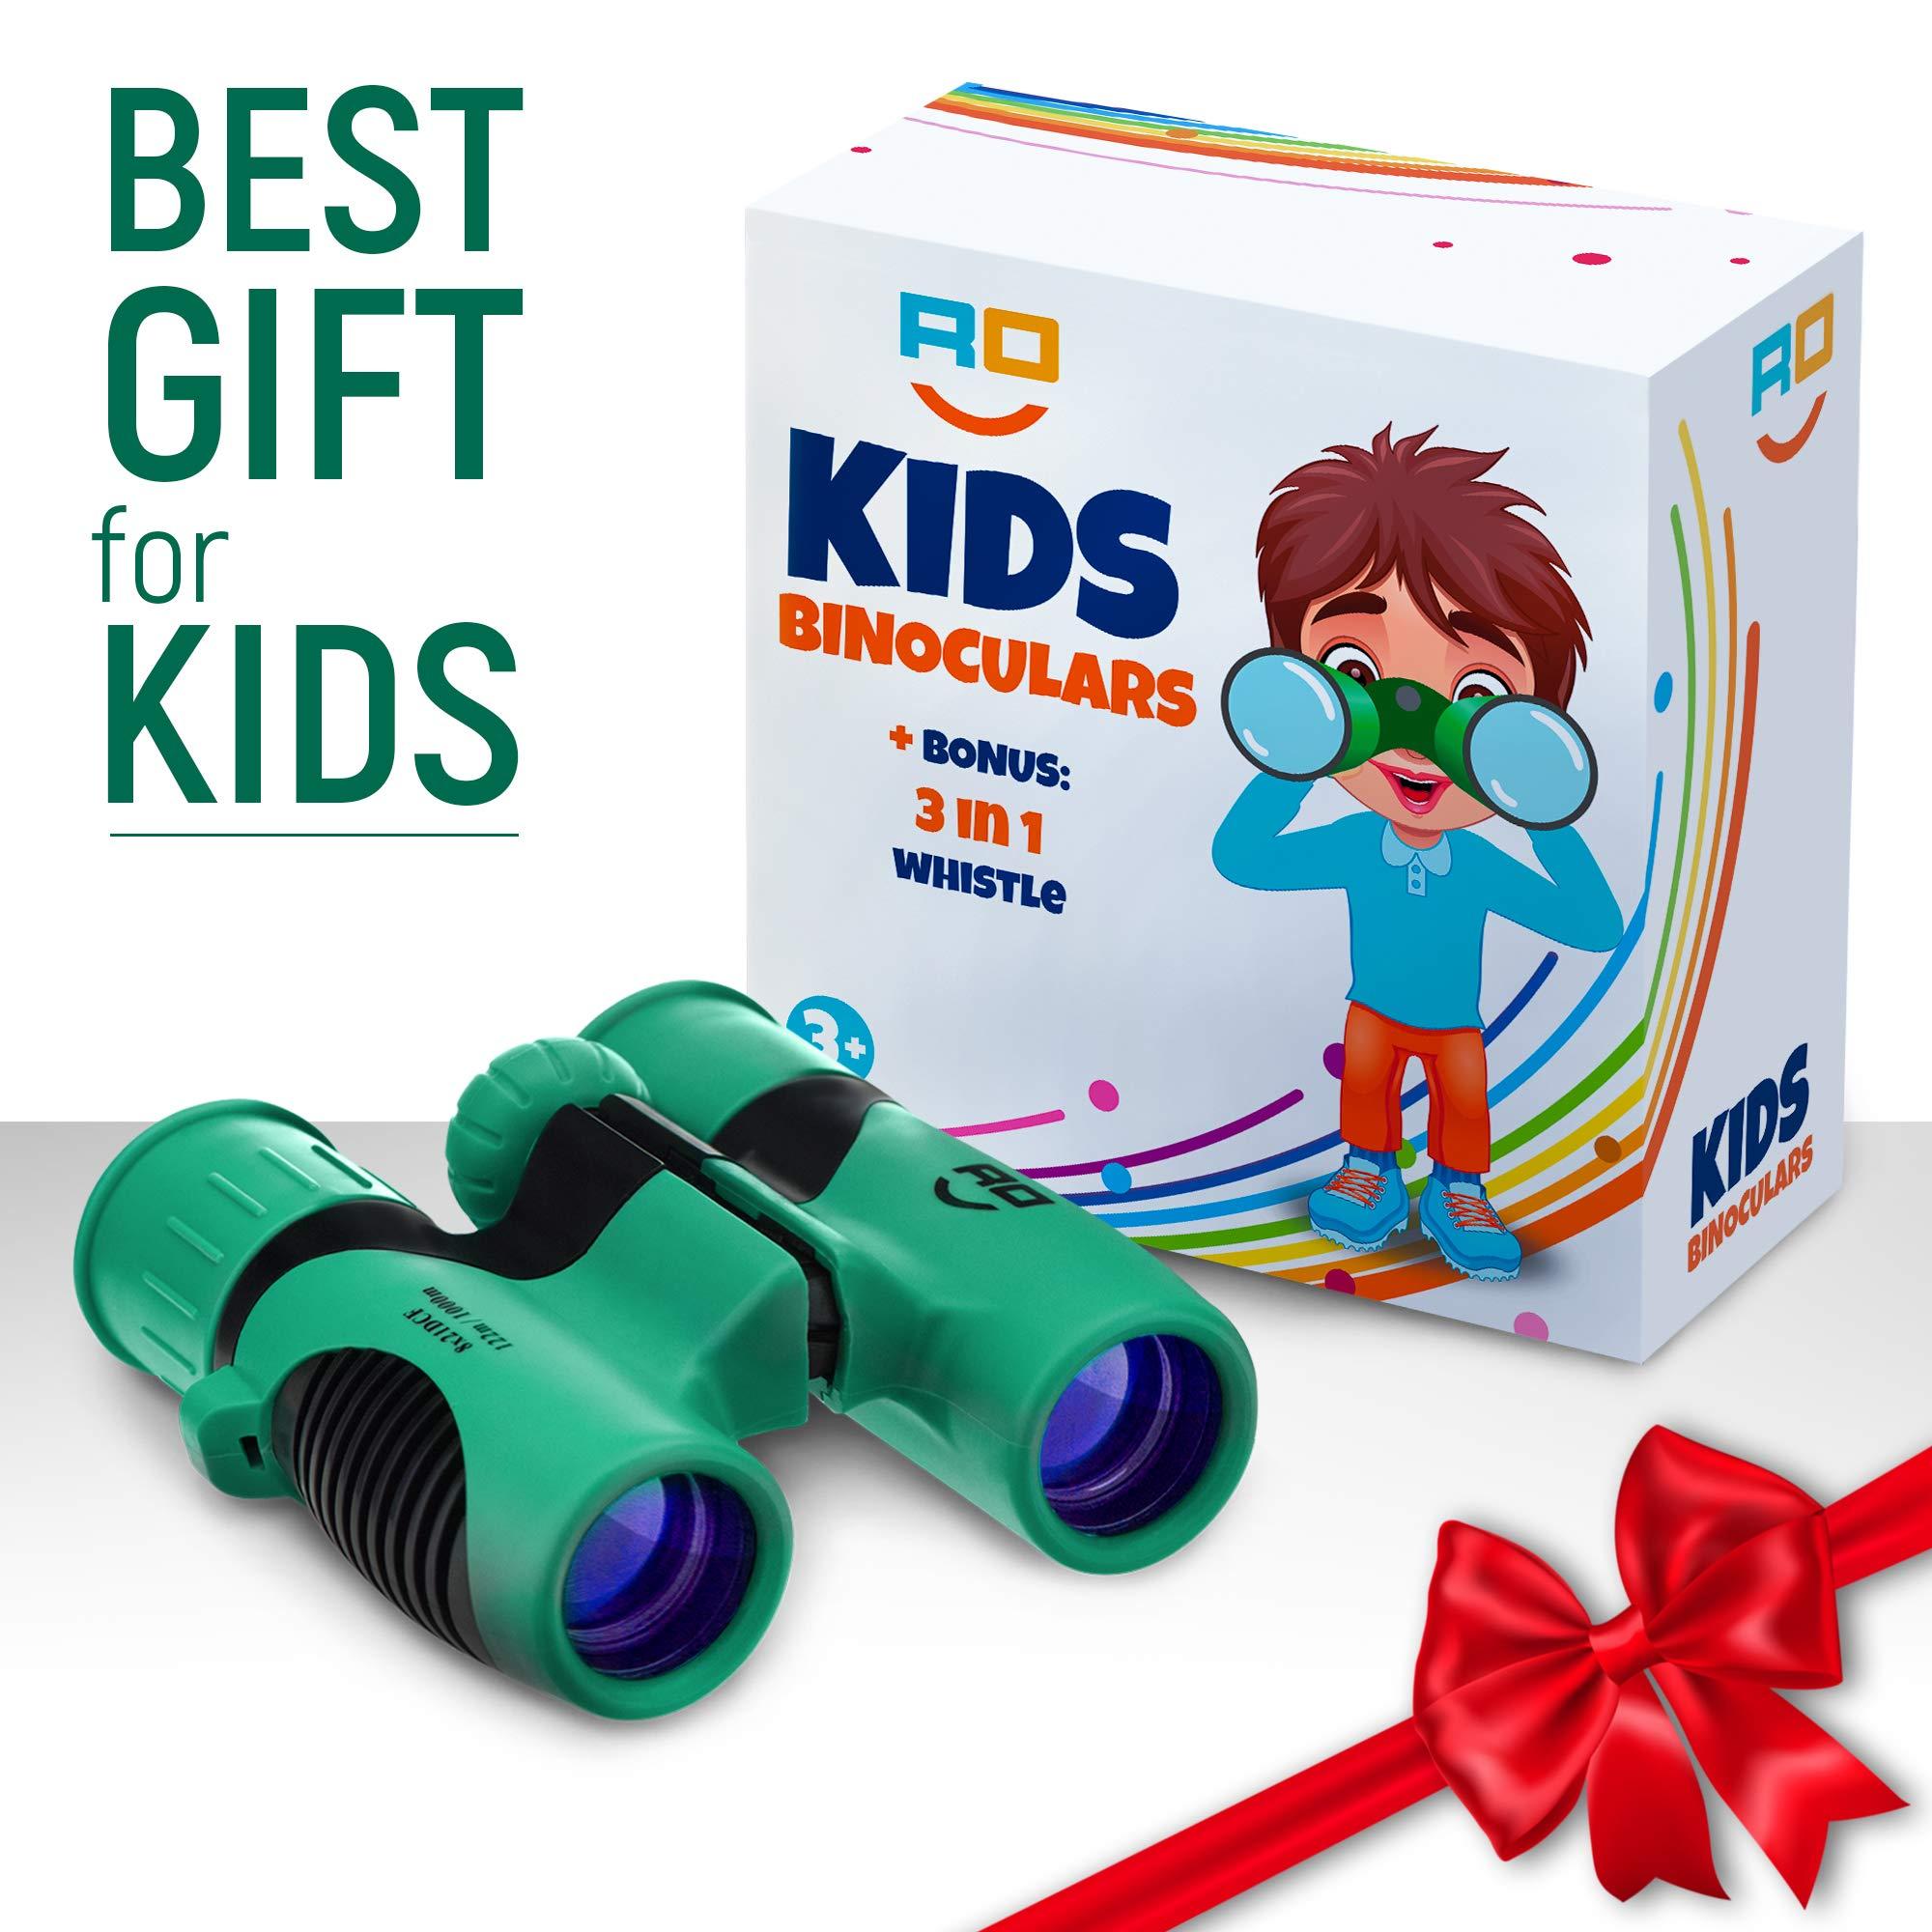 RO Kids Games Binoculars Compact Toy Set for Bird Watching, Spy Hiking Kit for Children, Outdoor Exploration Kit for Backyard Safari, Outside Play, Boys & Girls Binocular, Waterproof & Shockproof by RO kids games (Image #7)